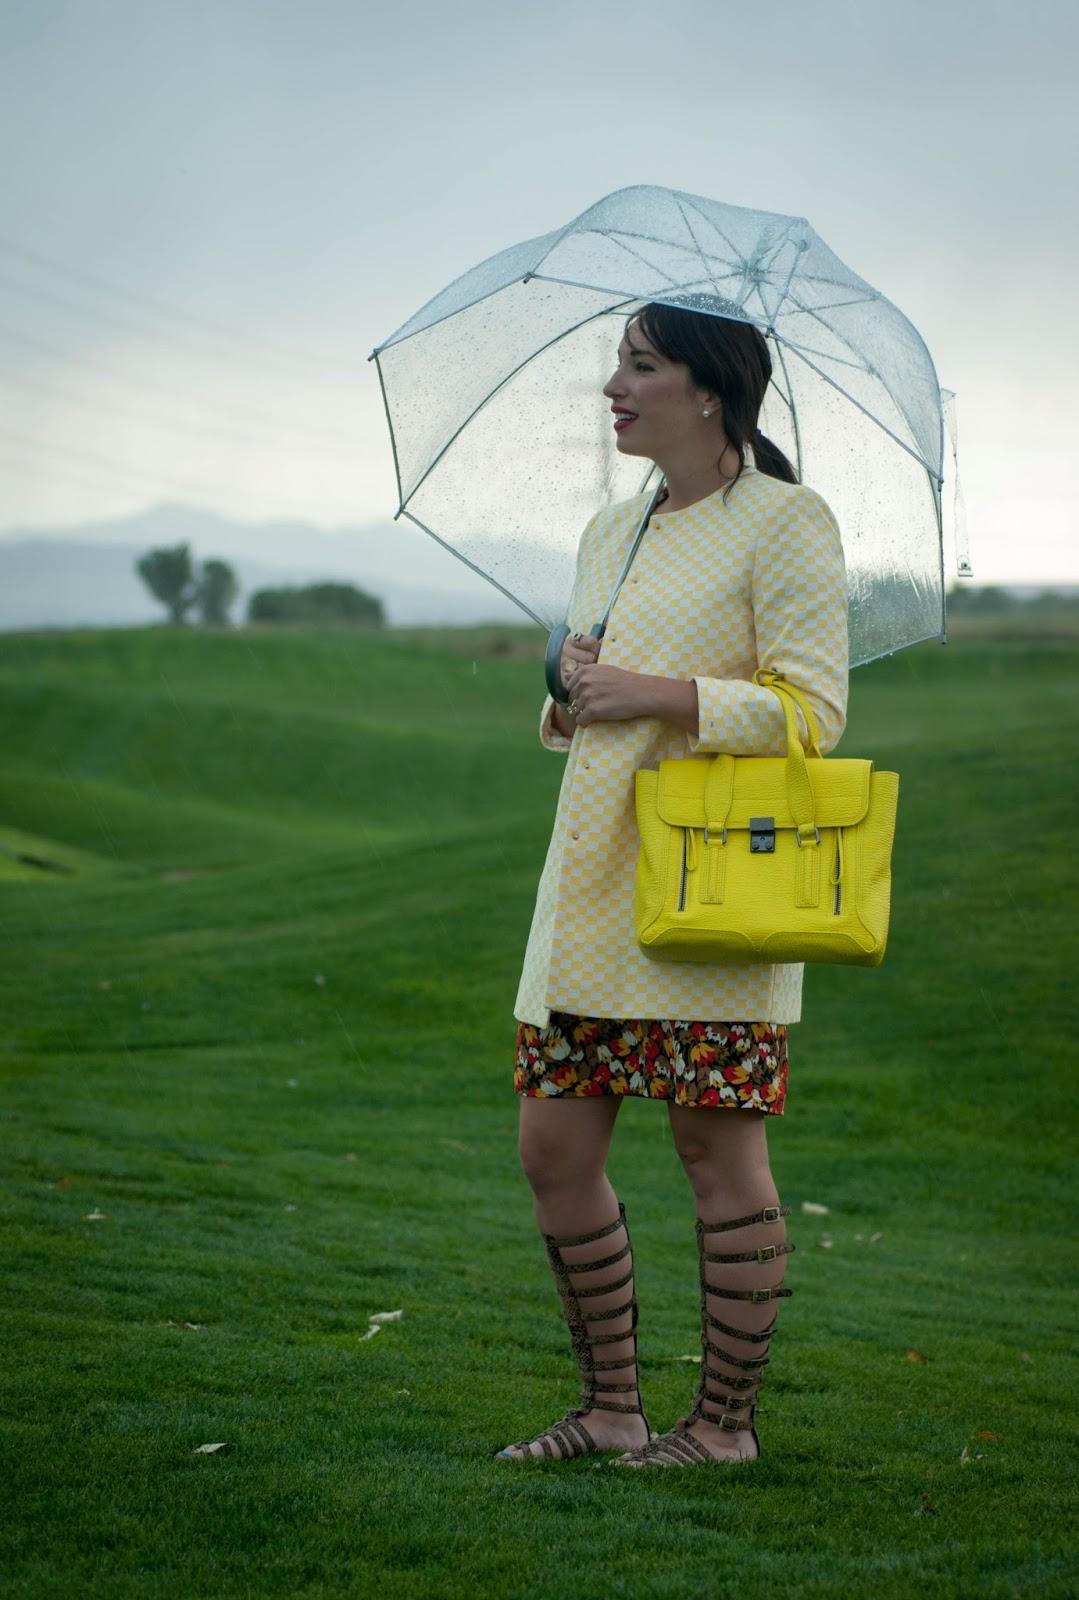 target umbrella, phillip lim pashli satchel, zara coat, gladiator sandals, floral dress, ootd